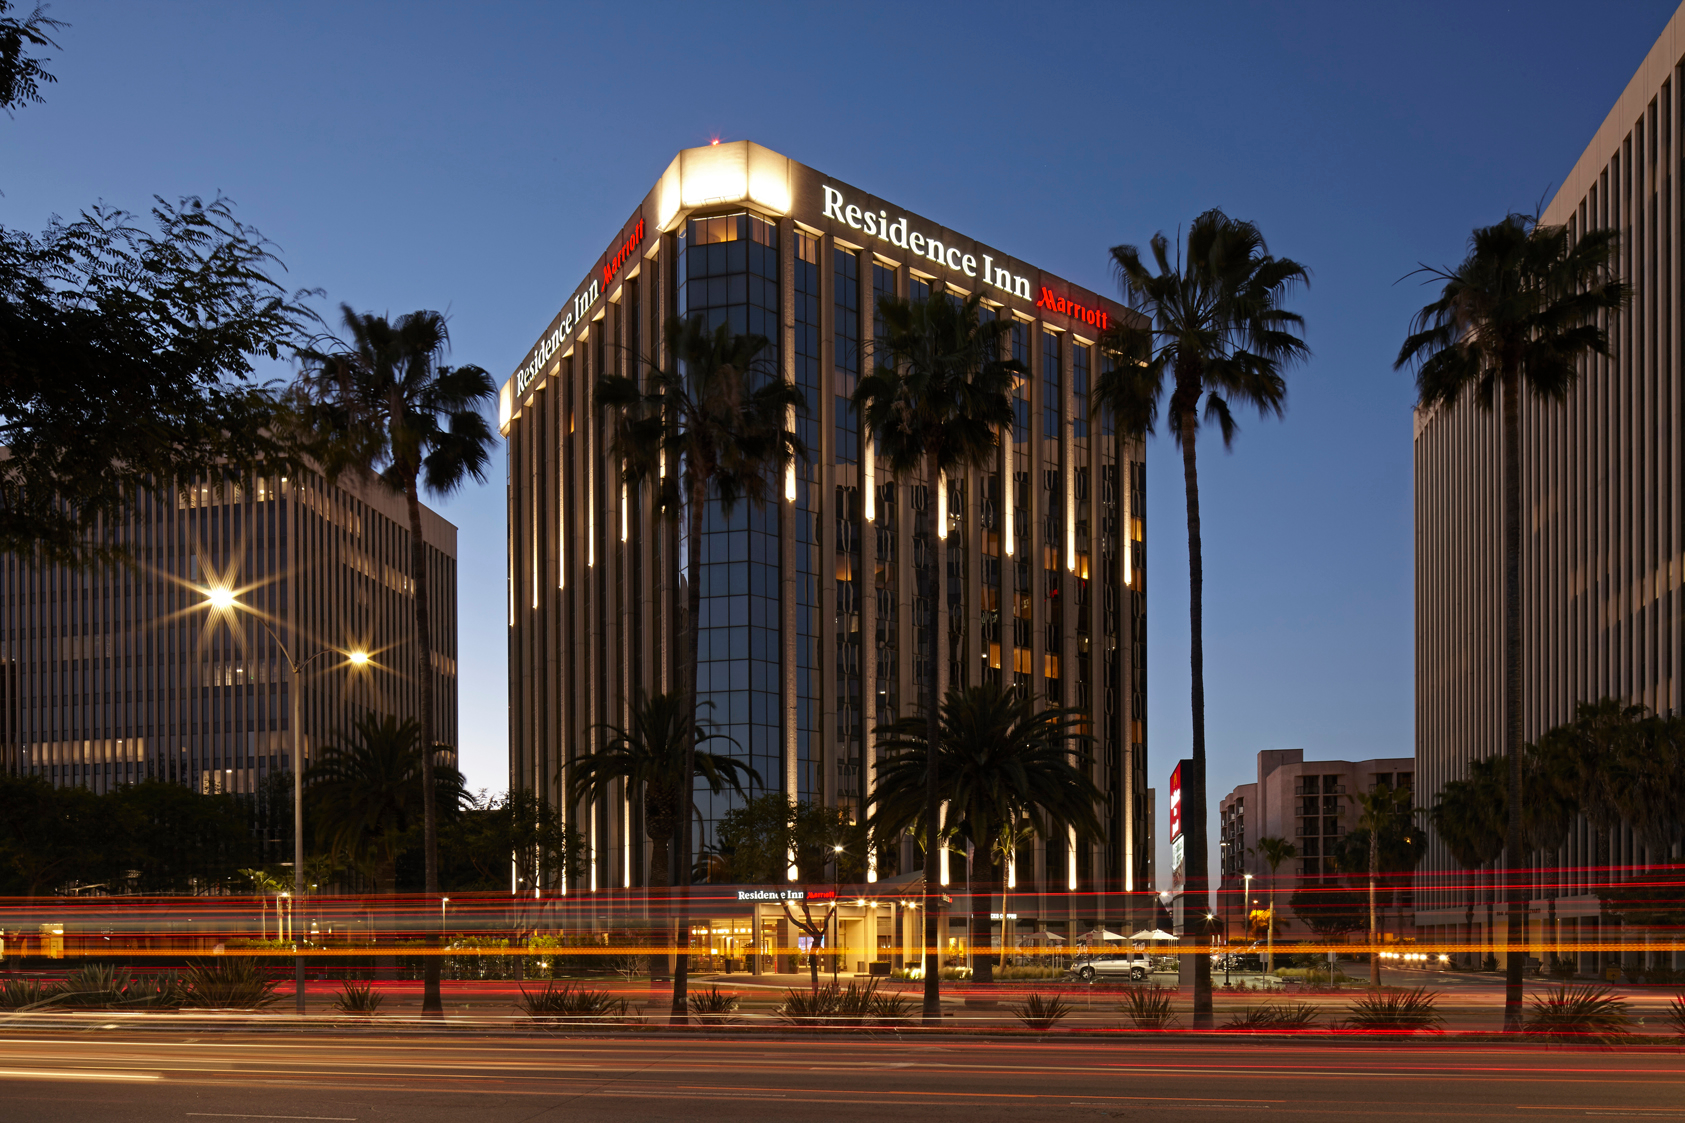 Residence Inn by Marriott Los Angeles LAX/Century Boulevard image 17